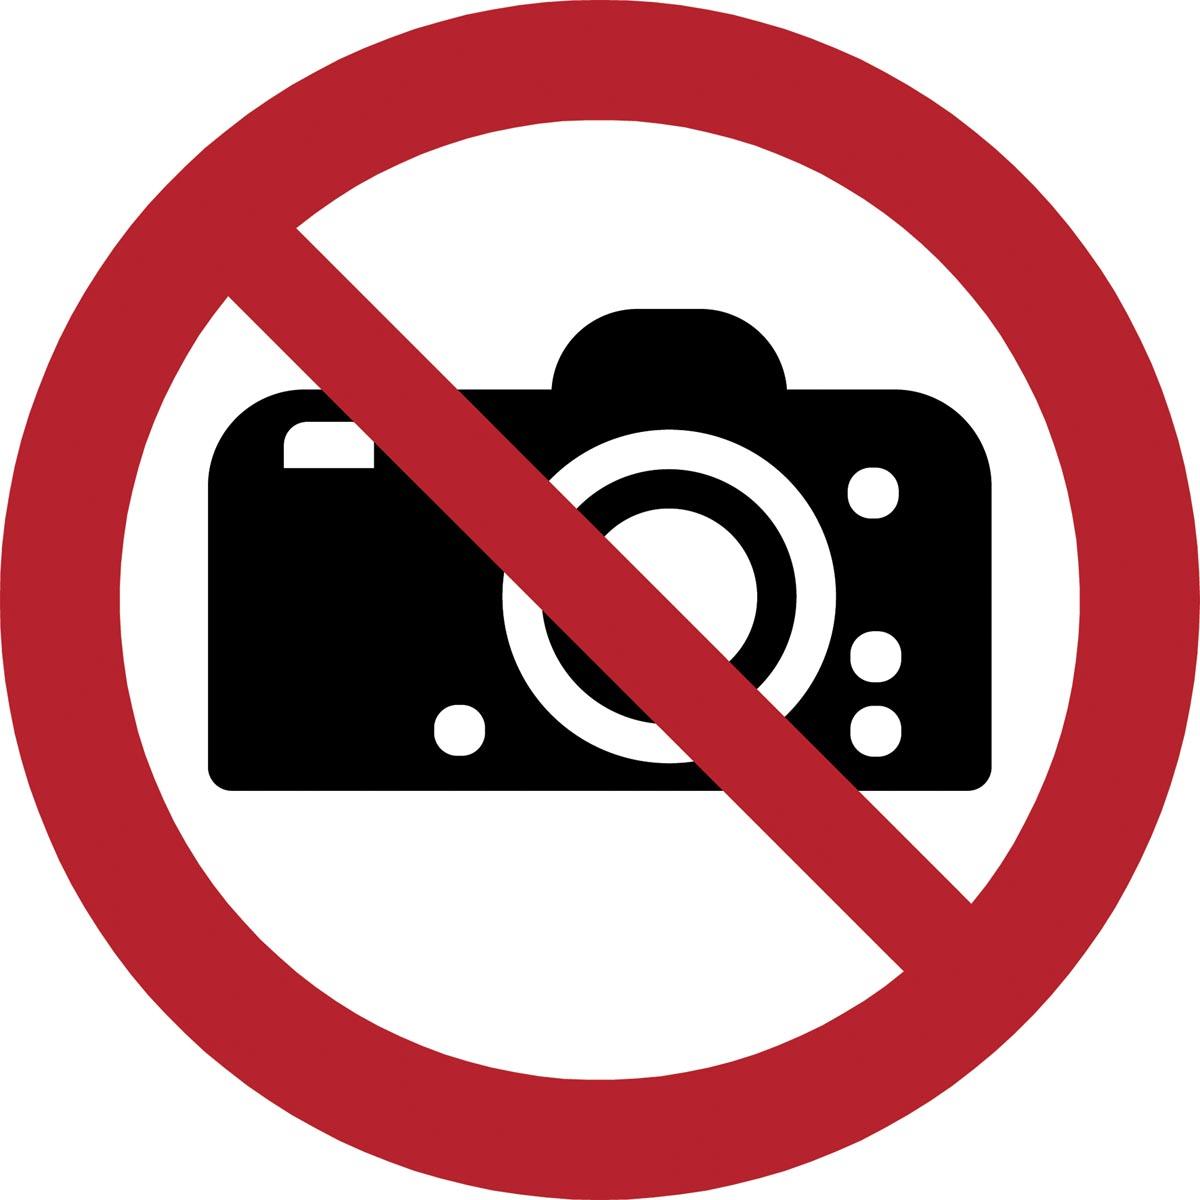 Tarifold verbodsbord uit PP, verboden te fotograferen, diameter 20 cm